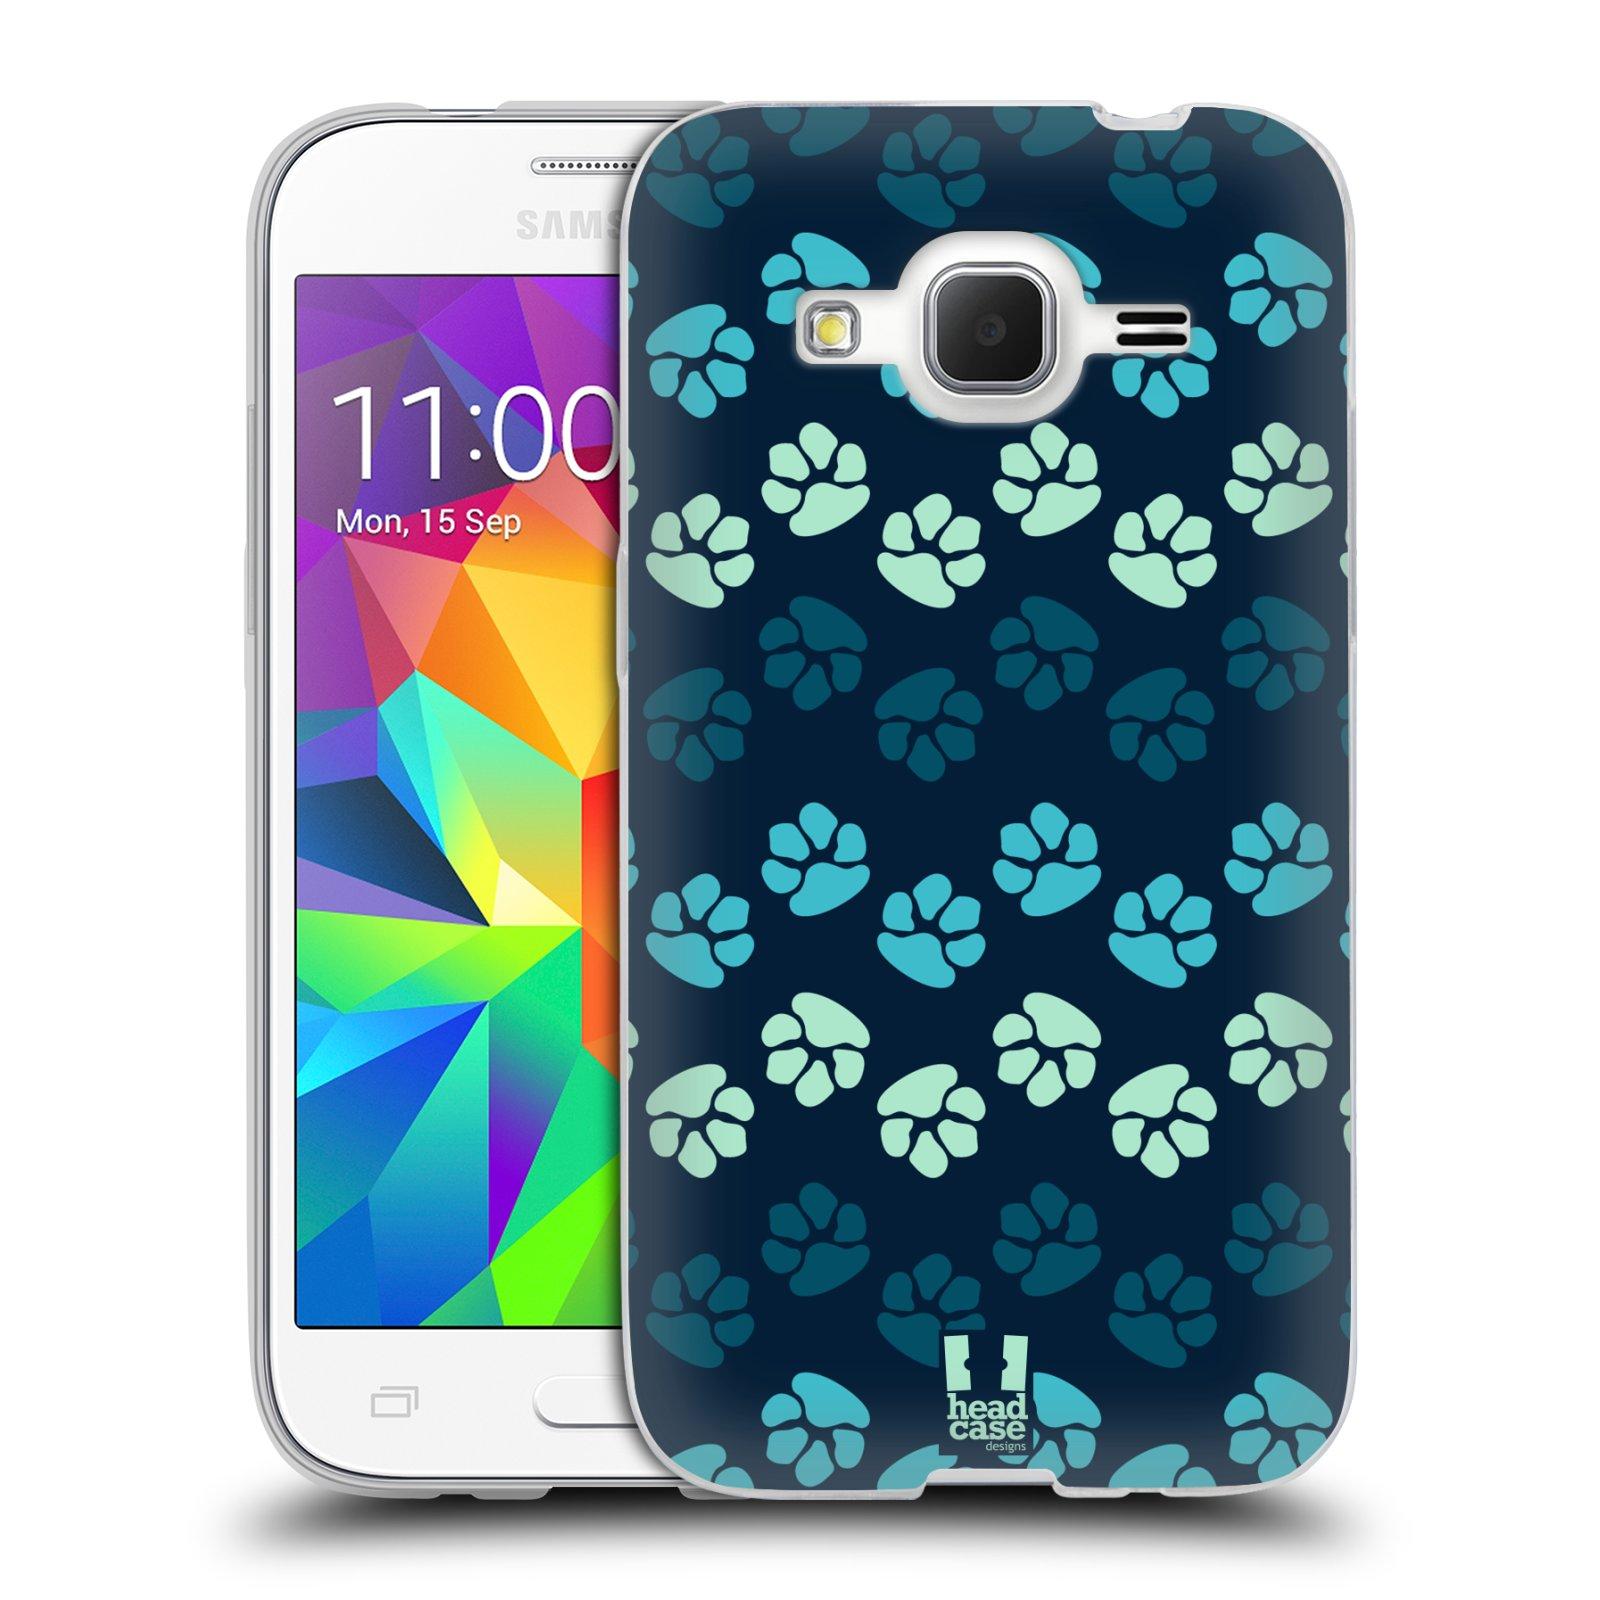 Silikonové pouzdro na mobil Samsung Galaxy Core Prime LTE HEAD CASE TLAPKY MODRÉ (Silikonový kryt či obal na mobilní telefon Samsung Galaxy Core Prime LTE SM-G360)